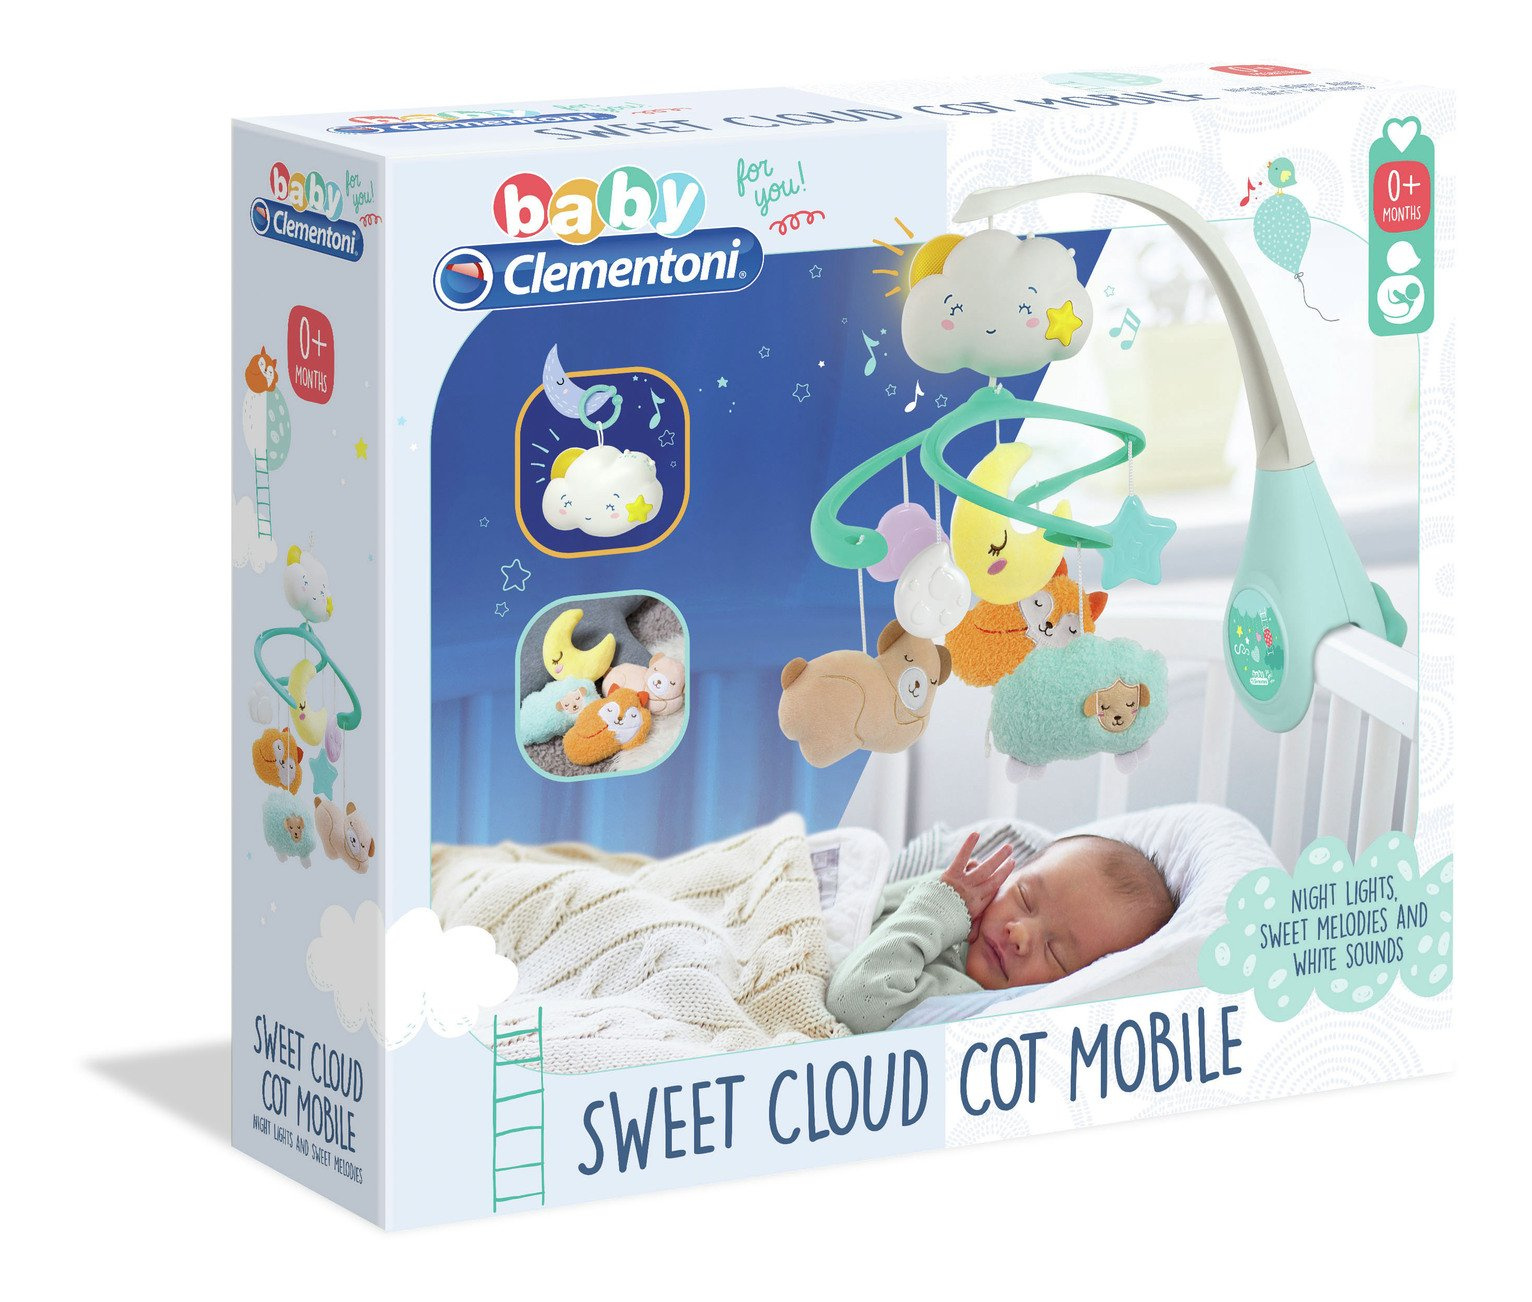 Baby Clementoni Sweet Cloud Cot Mobile